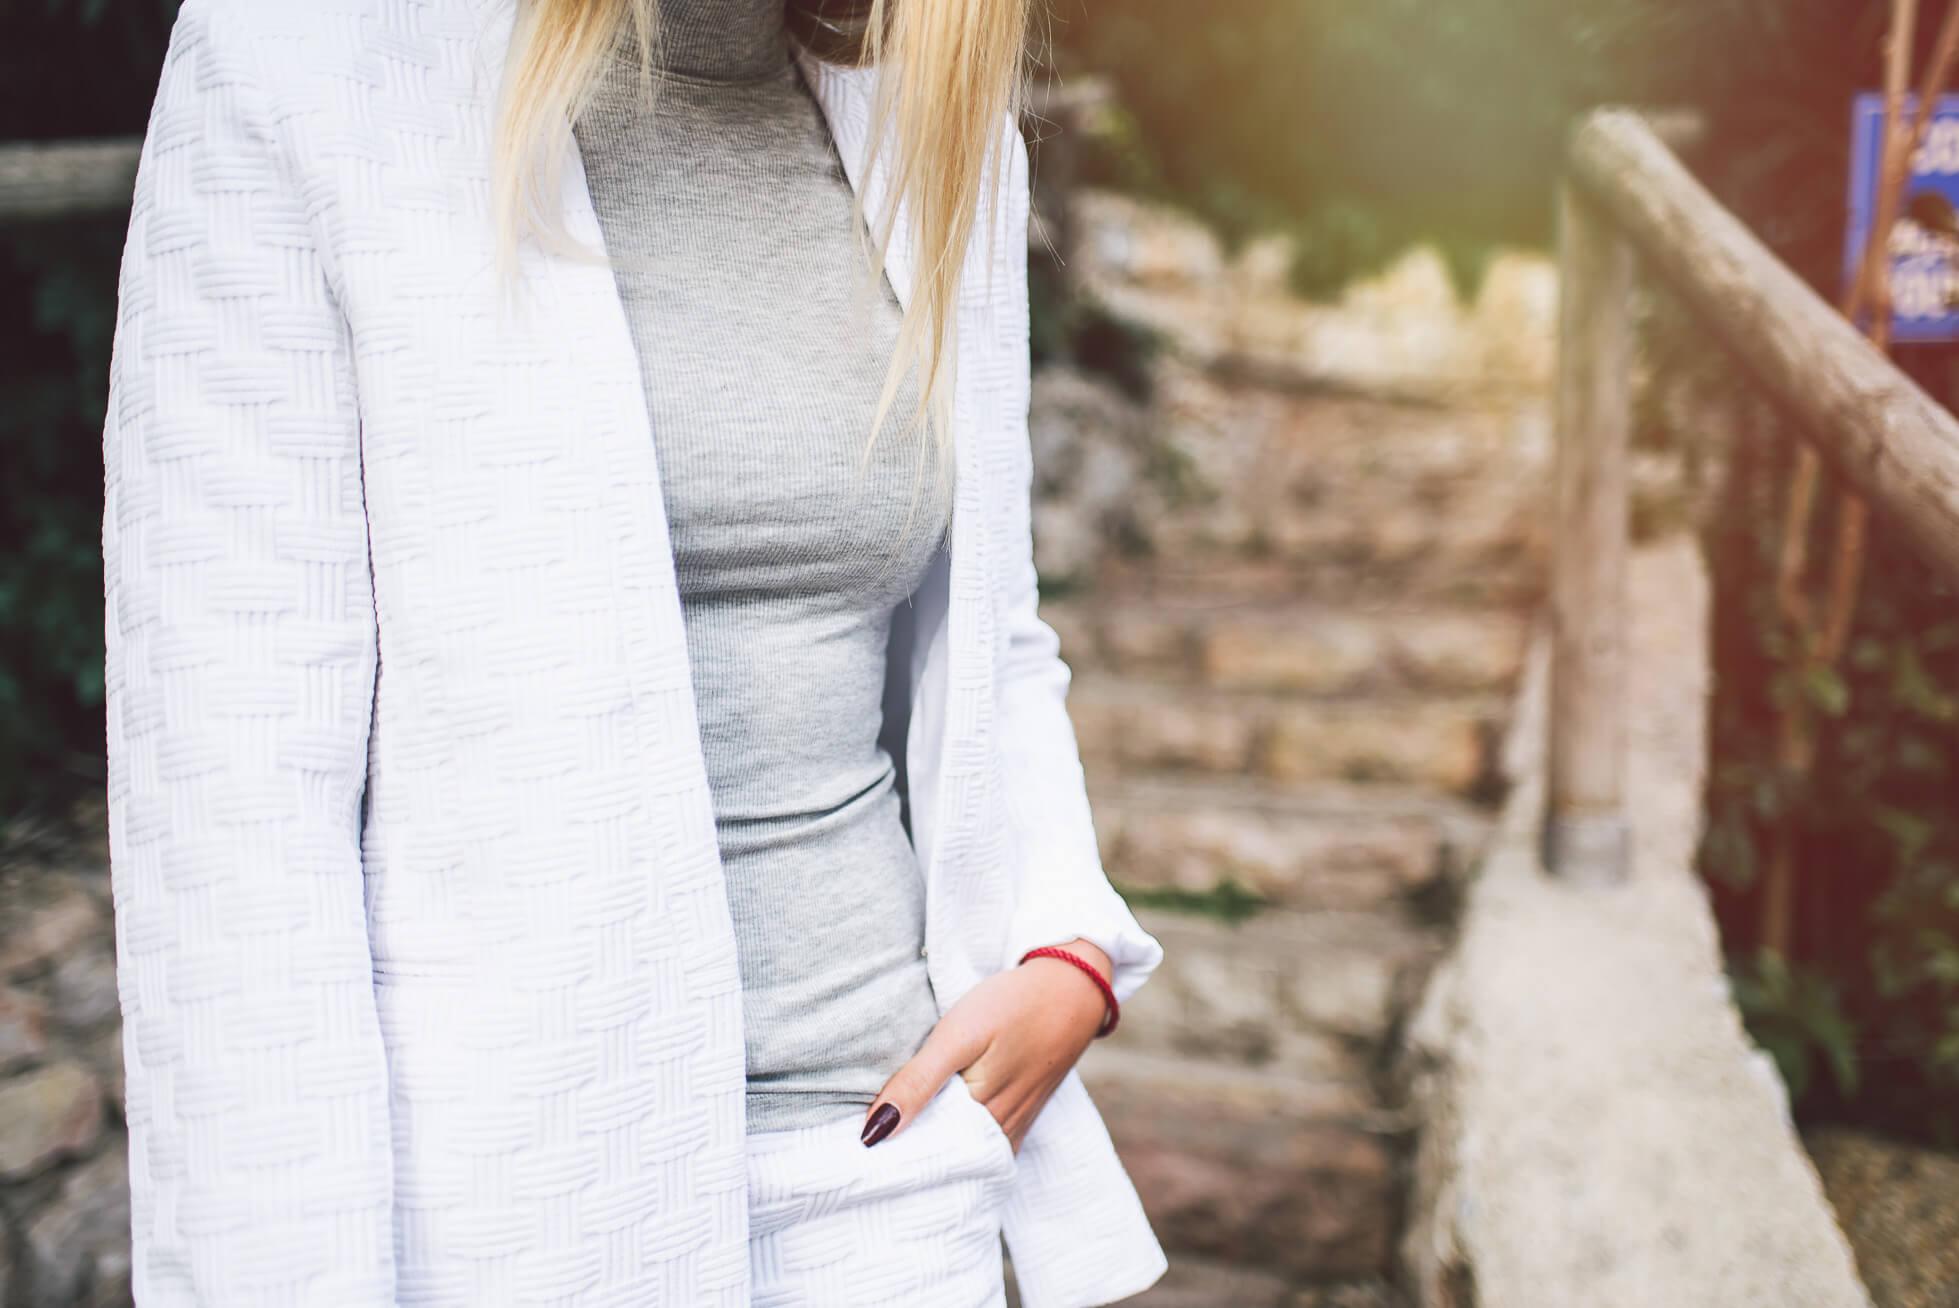 janni-deler-white-suitDSC_6923-Redigera